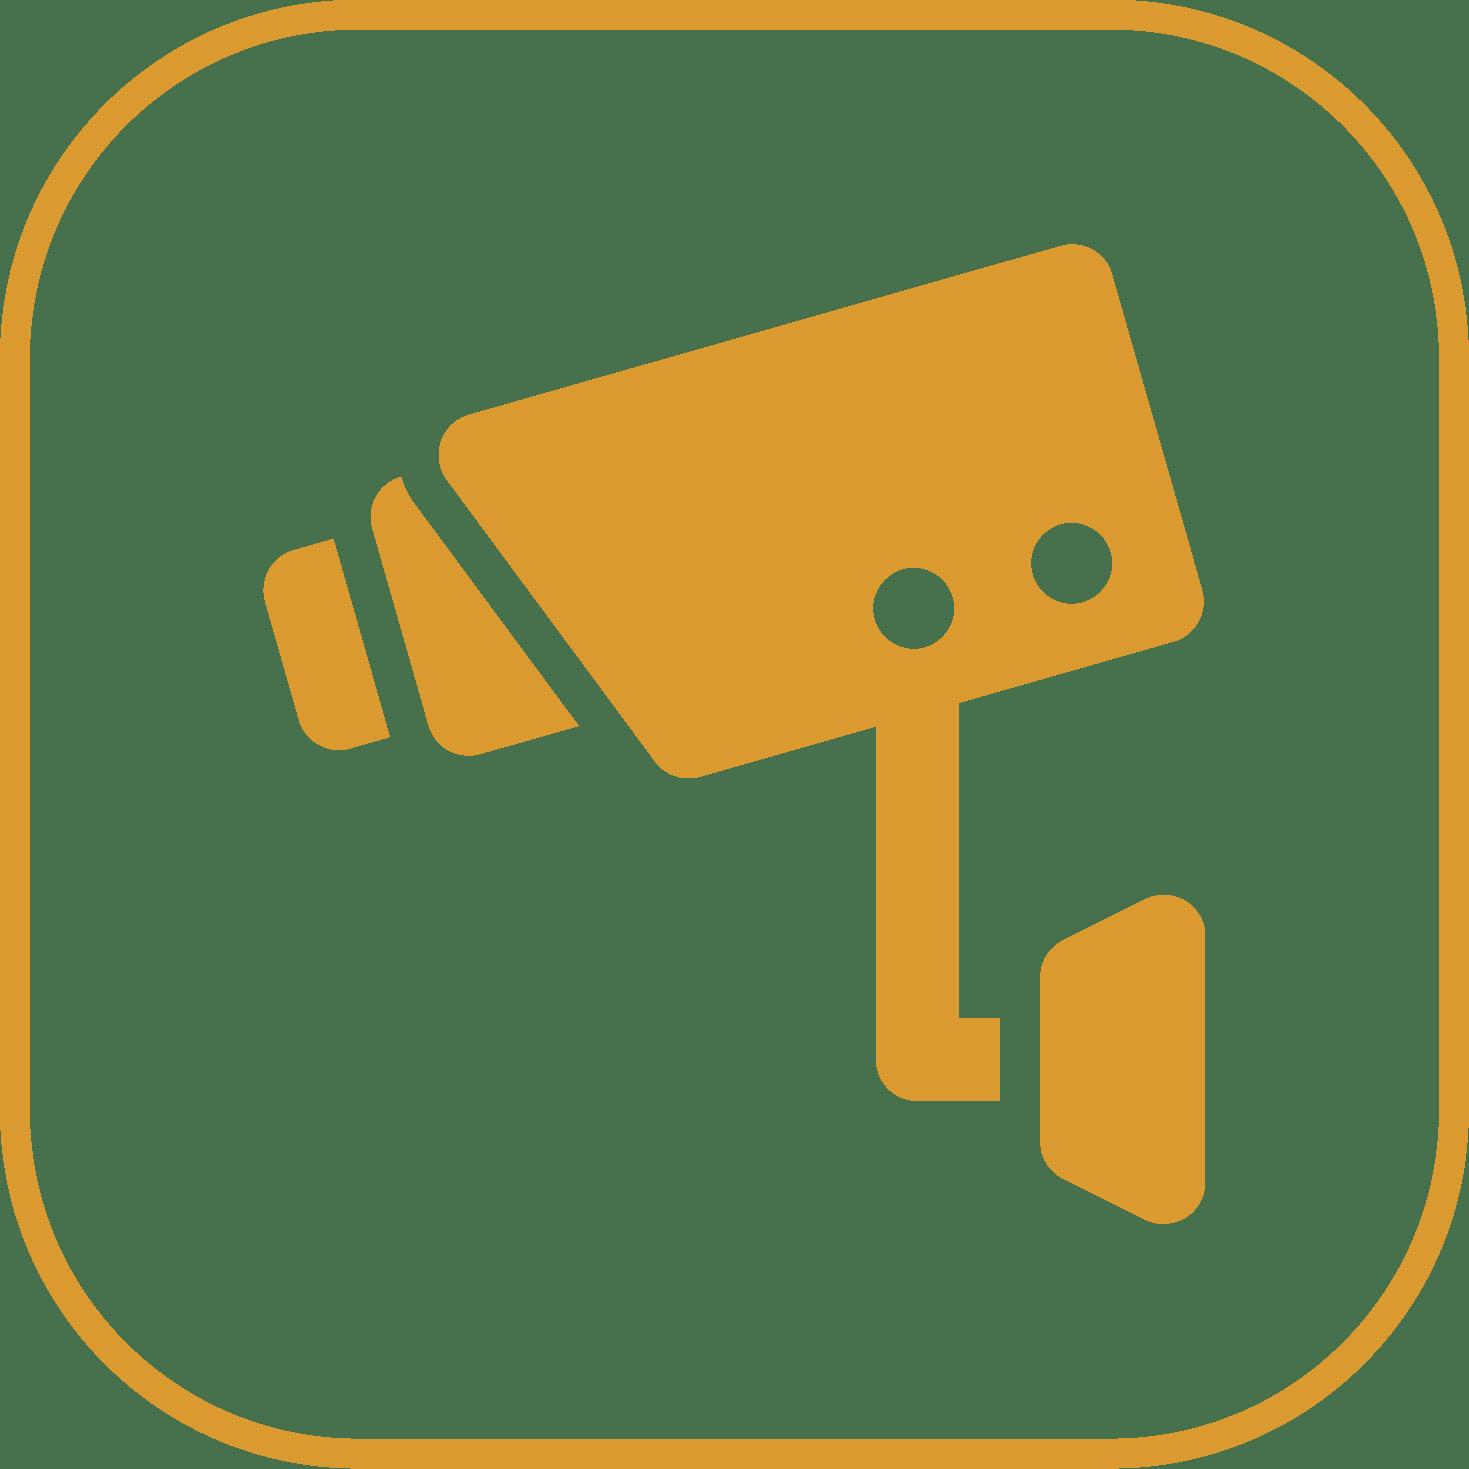 Pesona Remboelan Serpong - Rumah 2 Lantai Cukup DP 34 Juta Langsung Akad 10